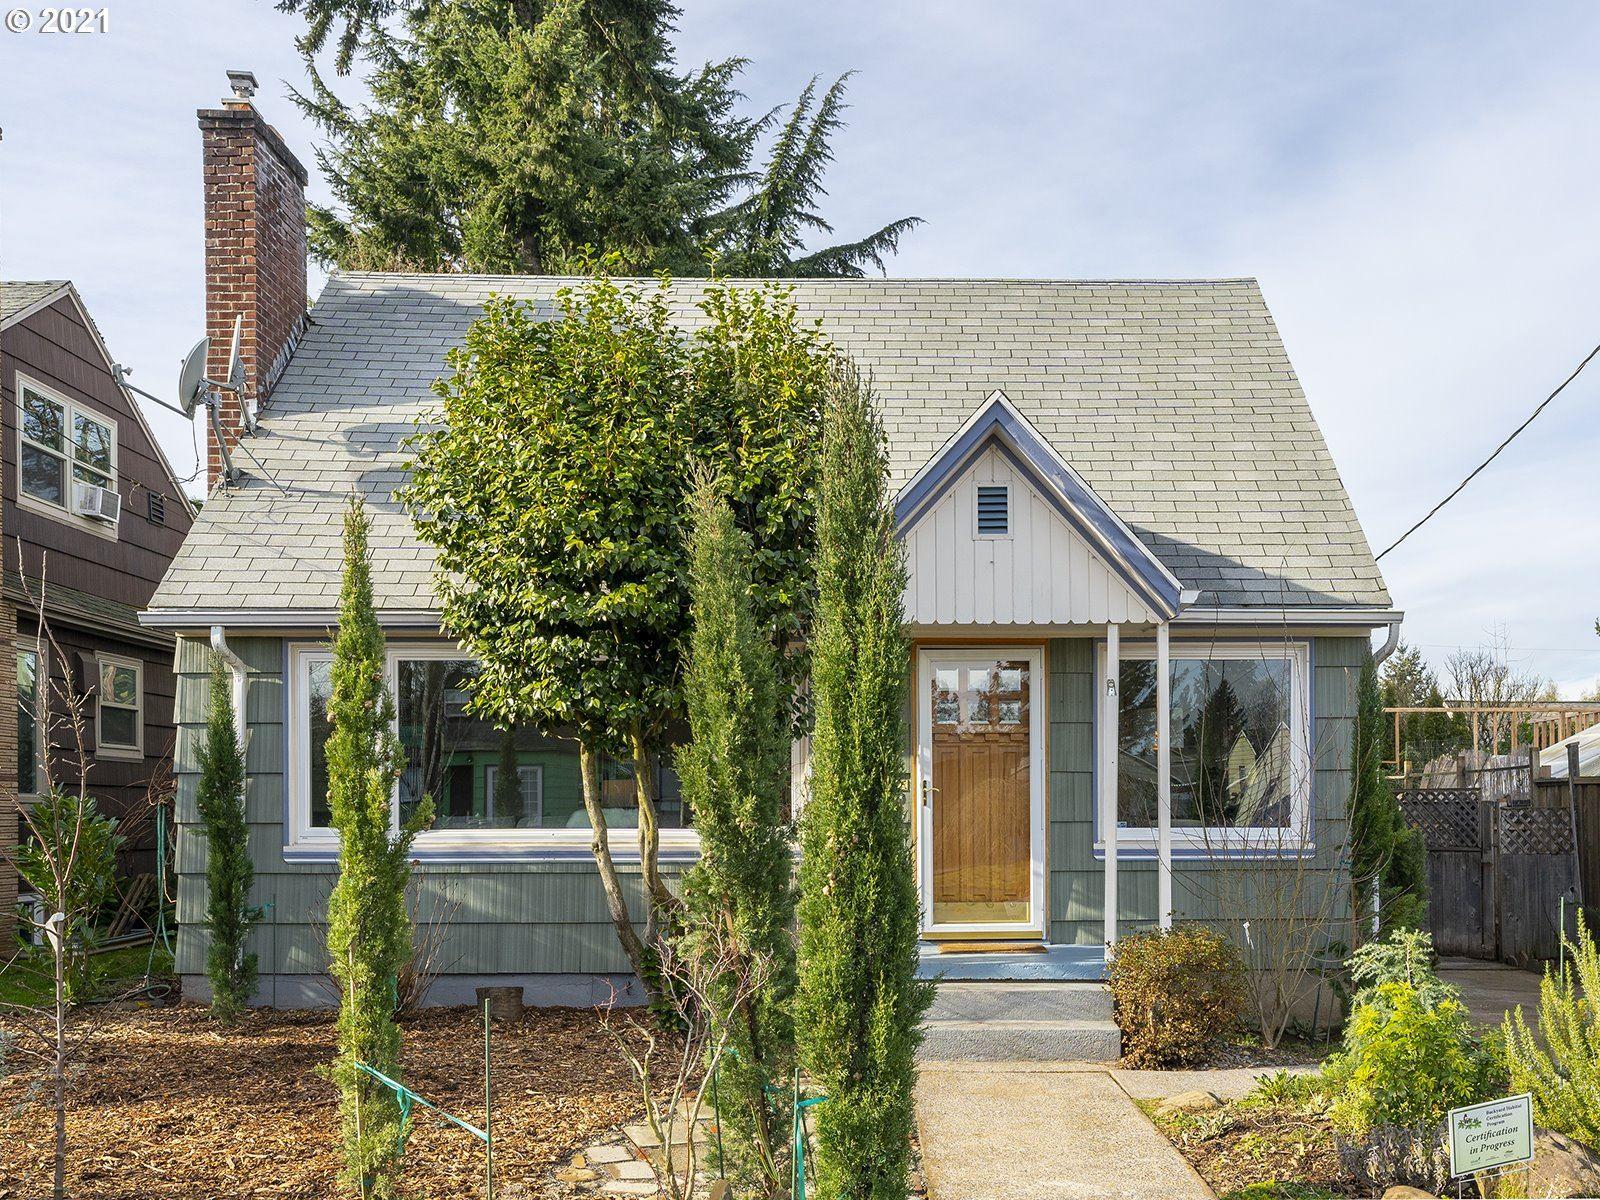 4315 NE 64TH AVE, Portland, OR 97218 - MLS#: 21481973